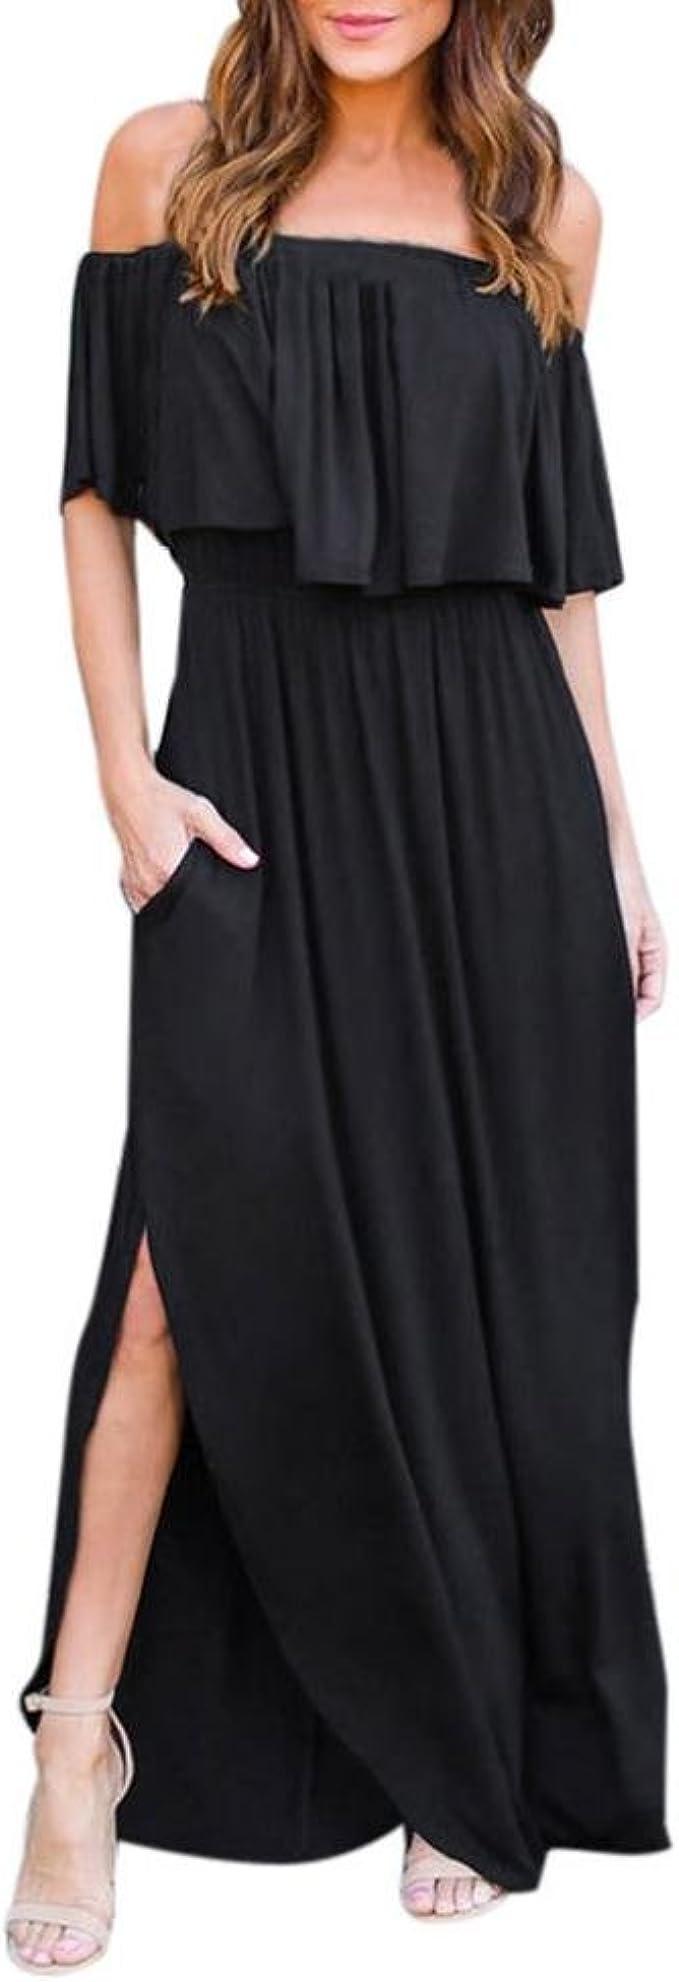 Longra Sommerkleider Damen Vintage Boho Maxikleid Off-Shoulder